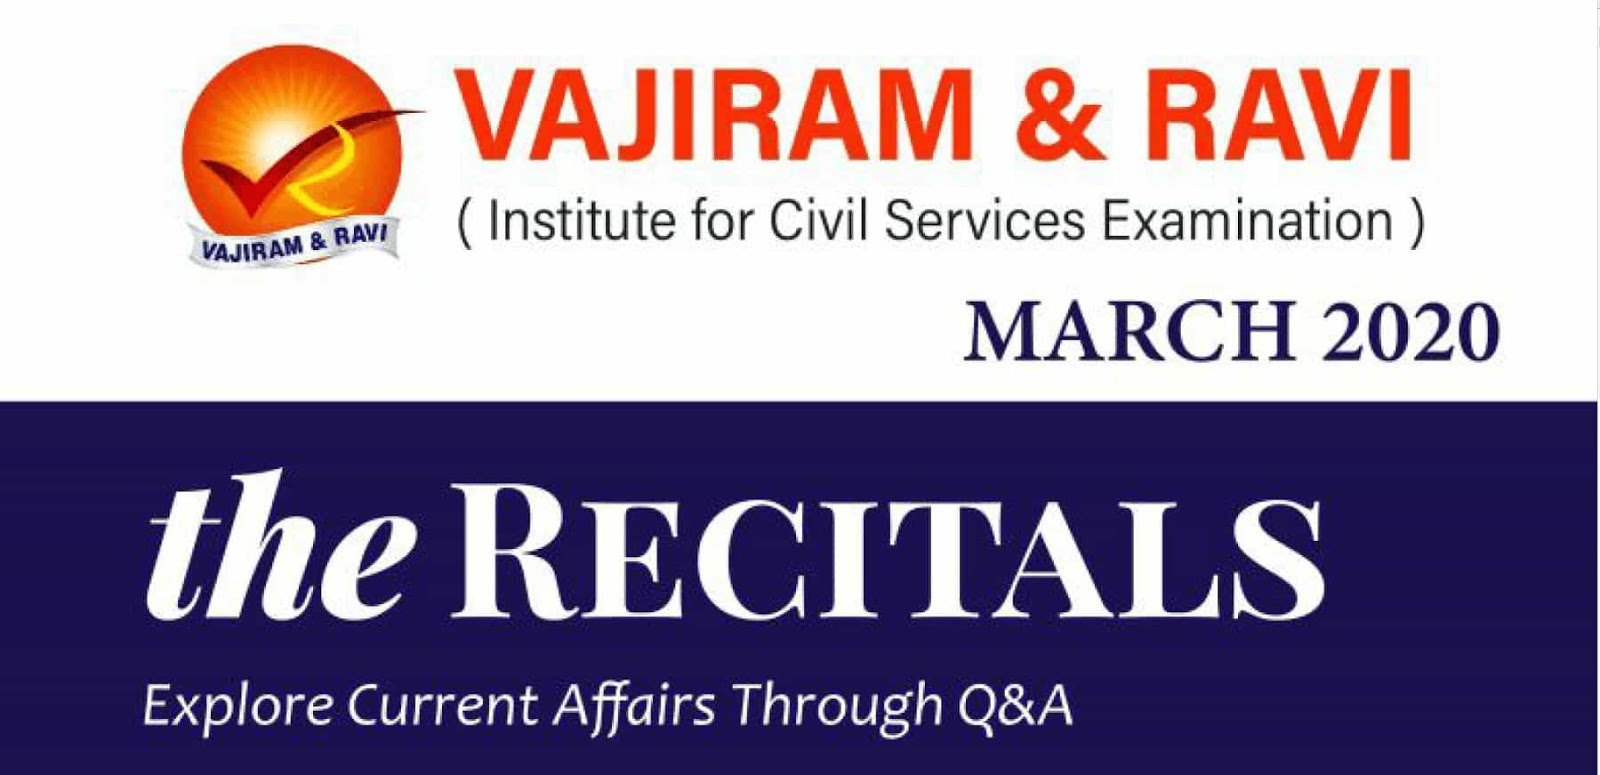 Vajiram Current Affairs March 2020